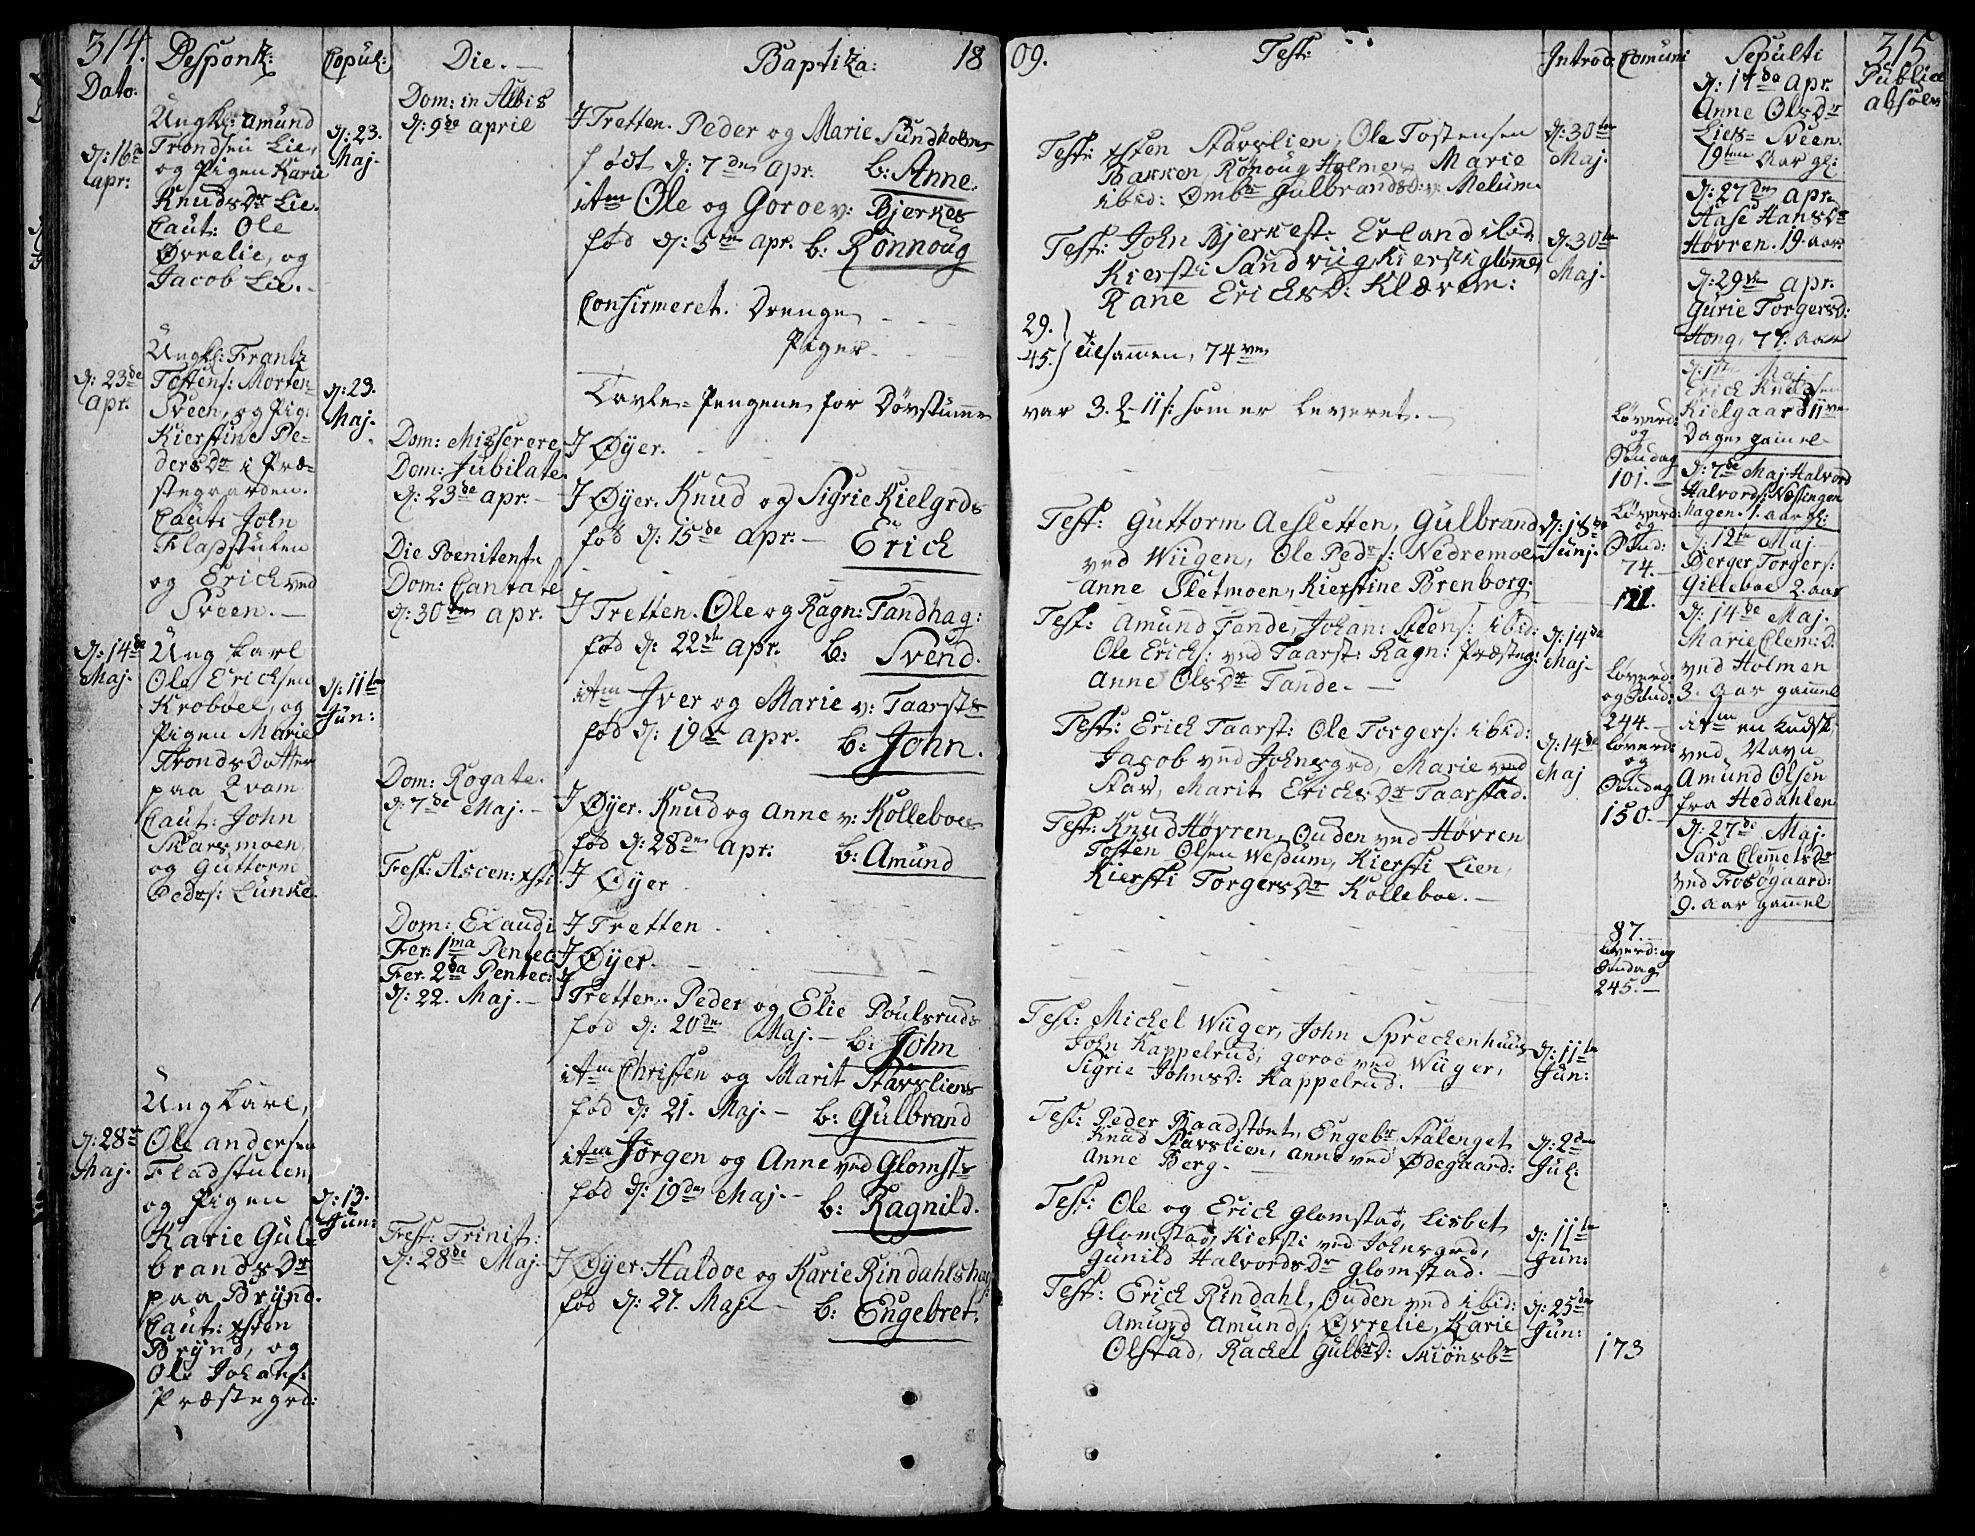 SAH, Øyer prestekontor, Ministerialbok nr. 3, 1784-1824, s. 314-315